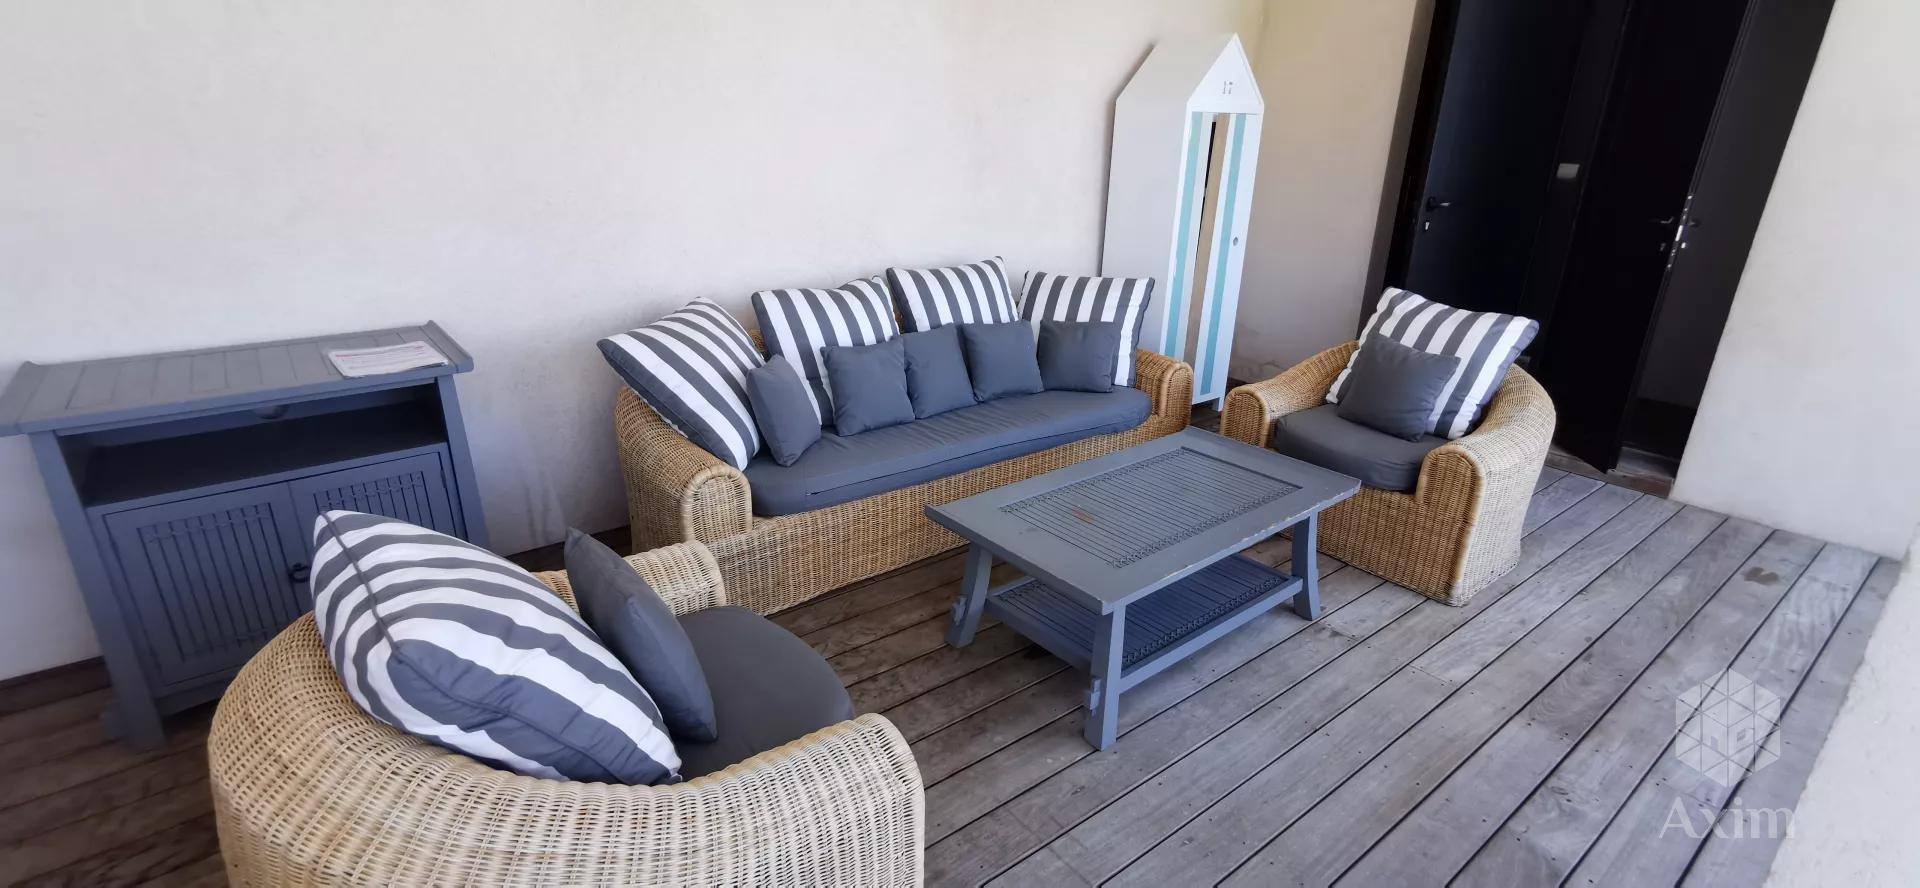 Affitto stagionale Villa - Saint-Raphaël Bord de mer